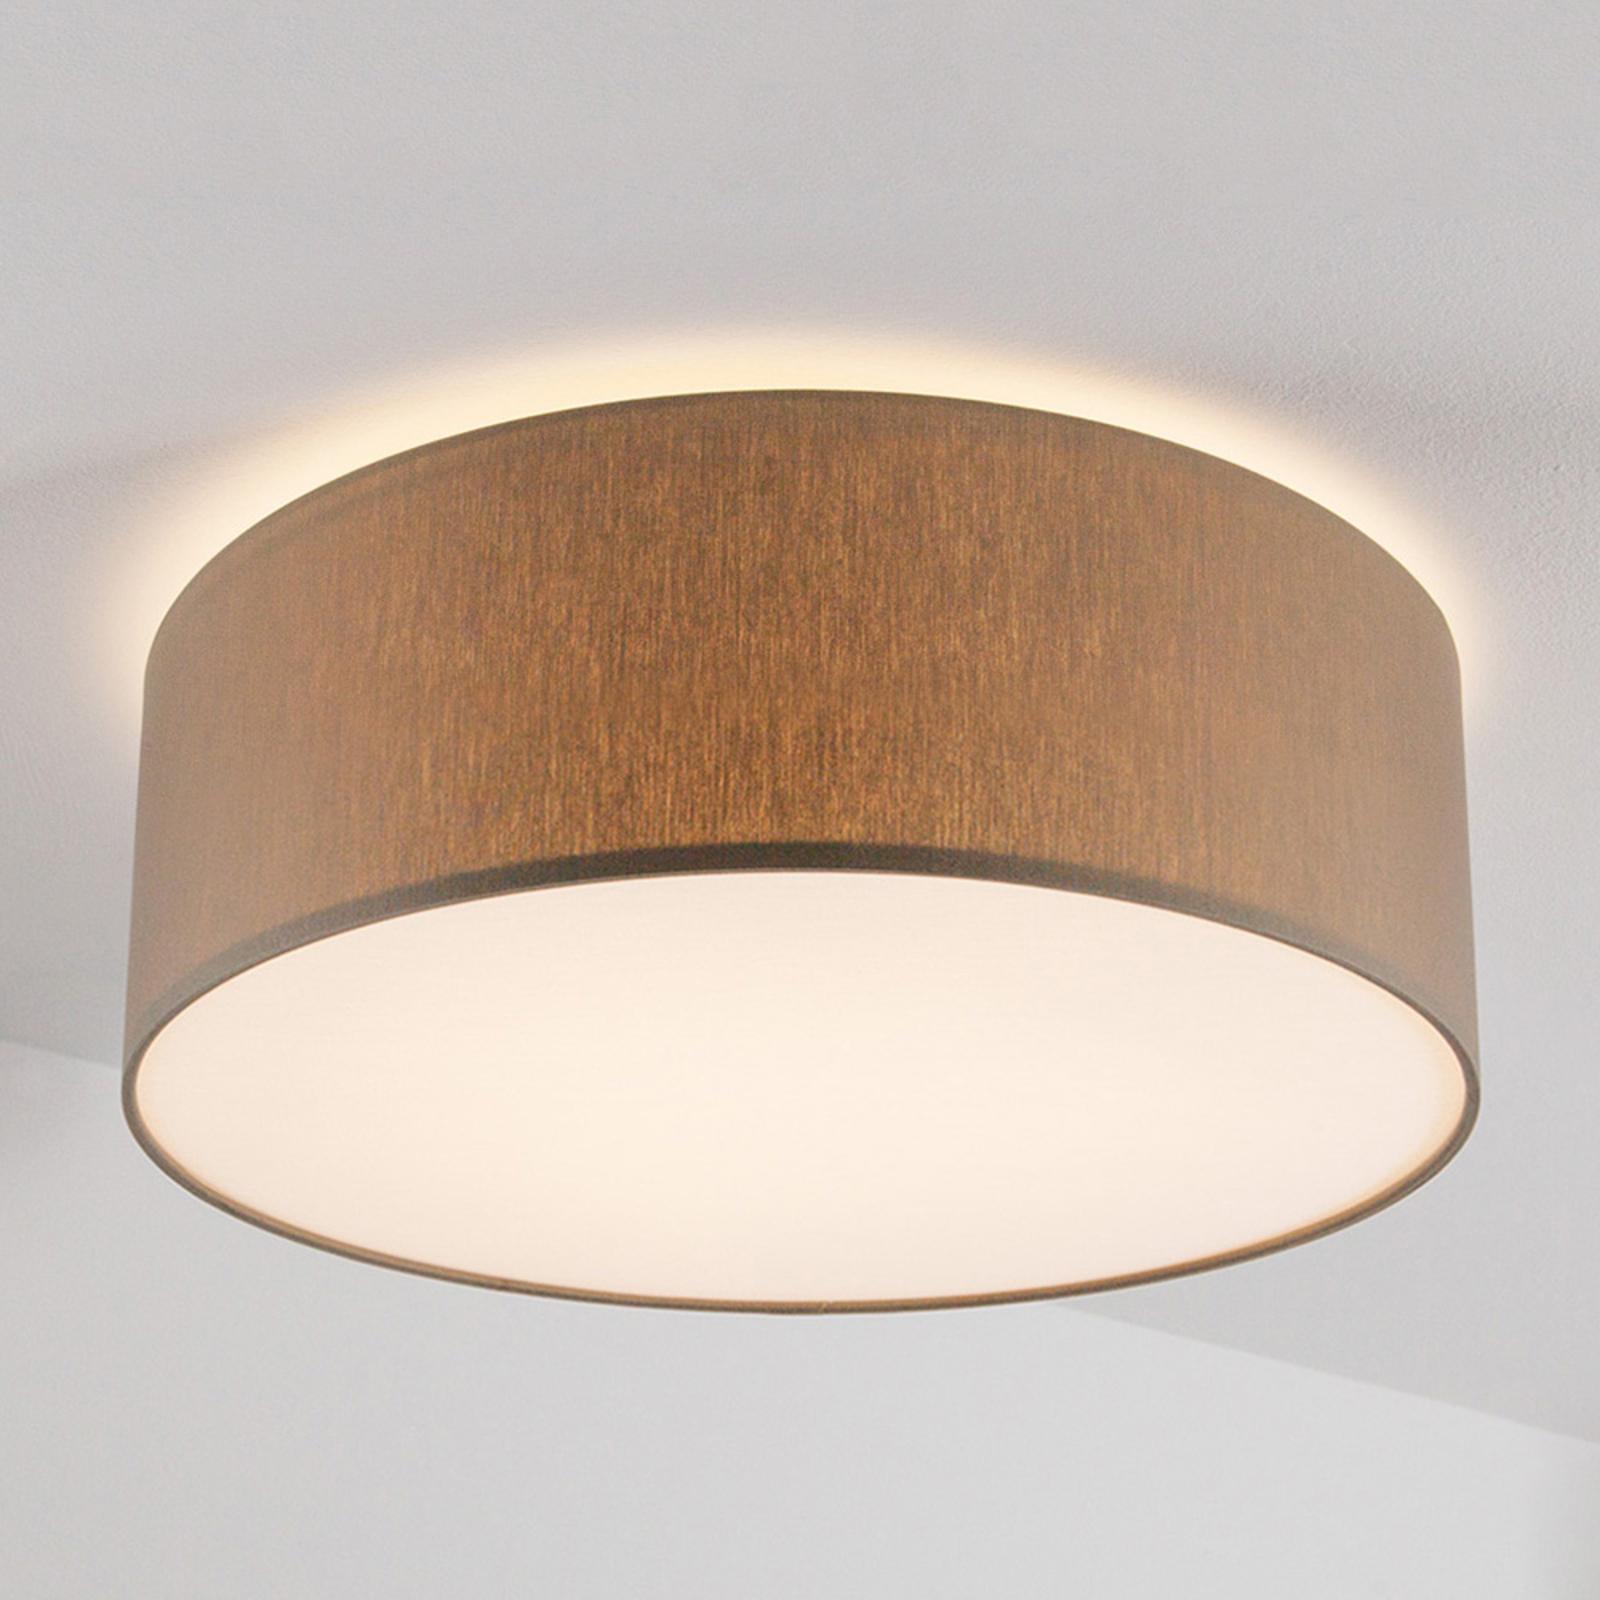 Grijsbruine plafondlamp Mara, 50 cm